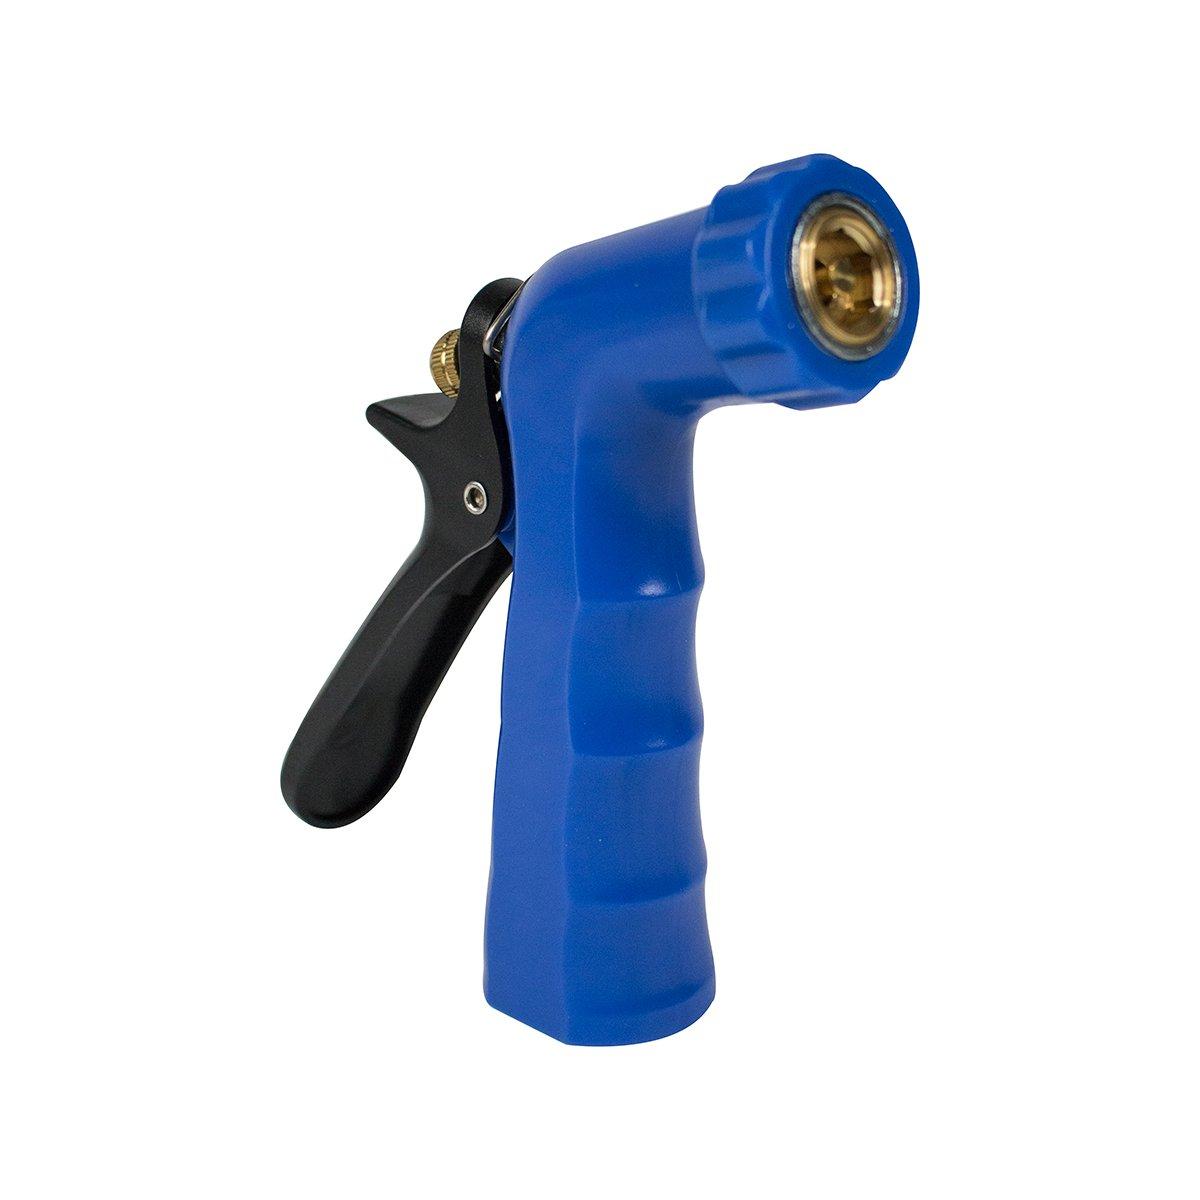 UltraSource-509484 Hose Spray Nozzle, Threaded, 100 psi, Blue